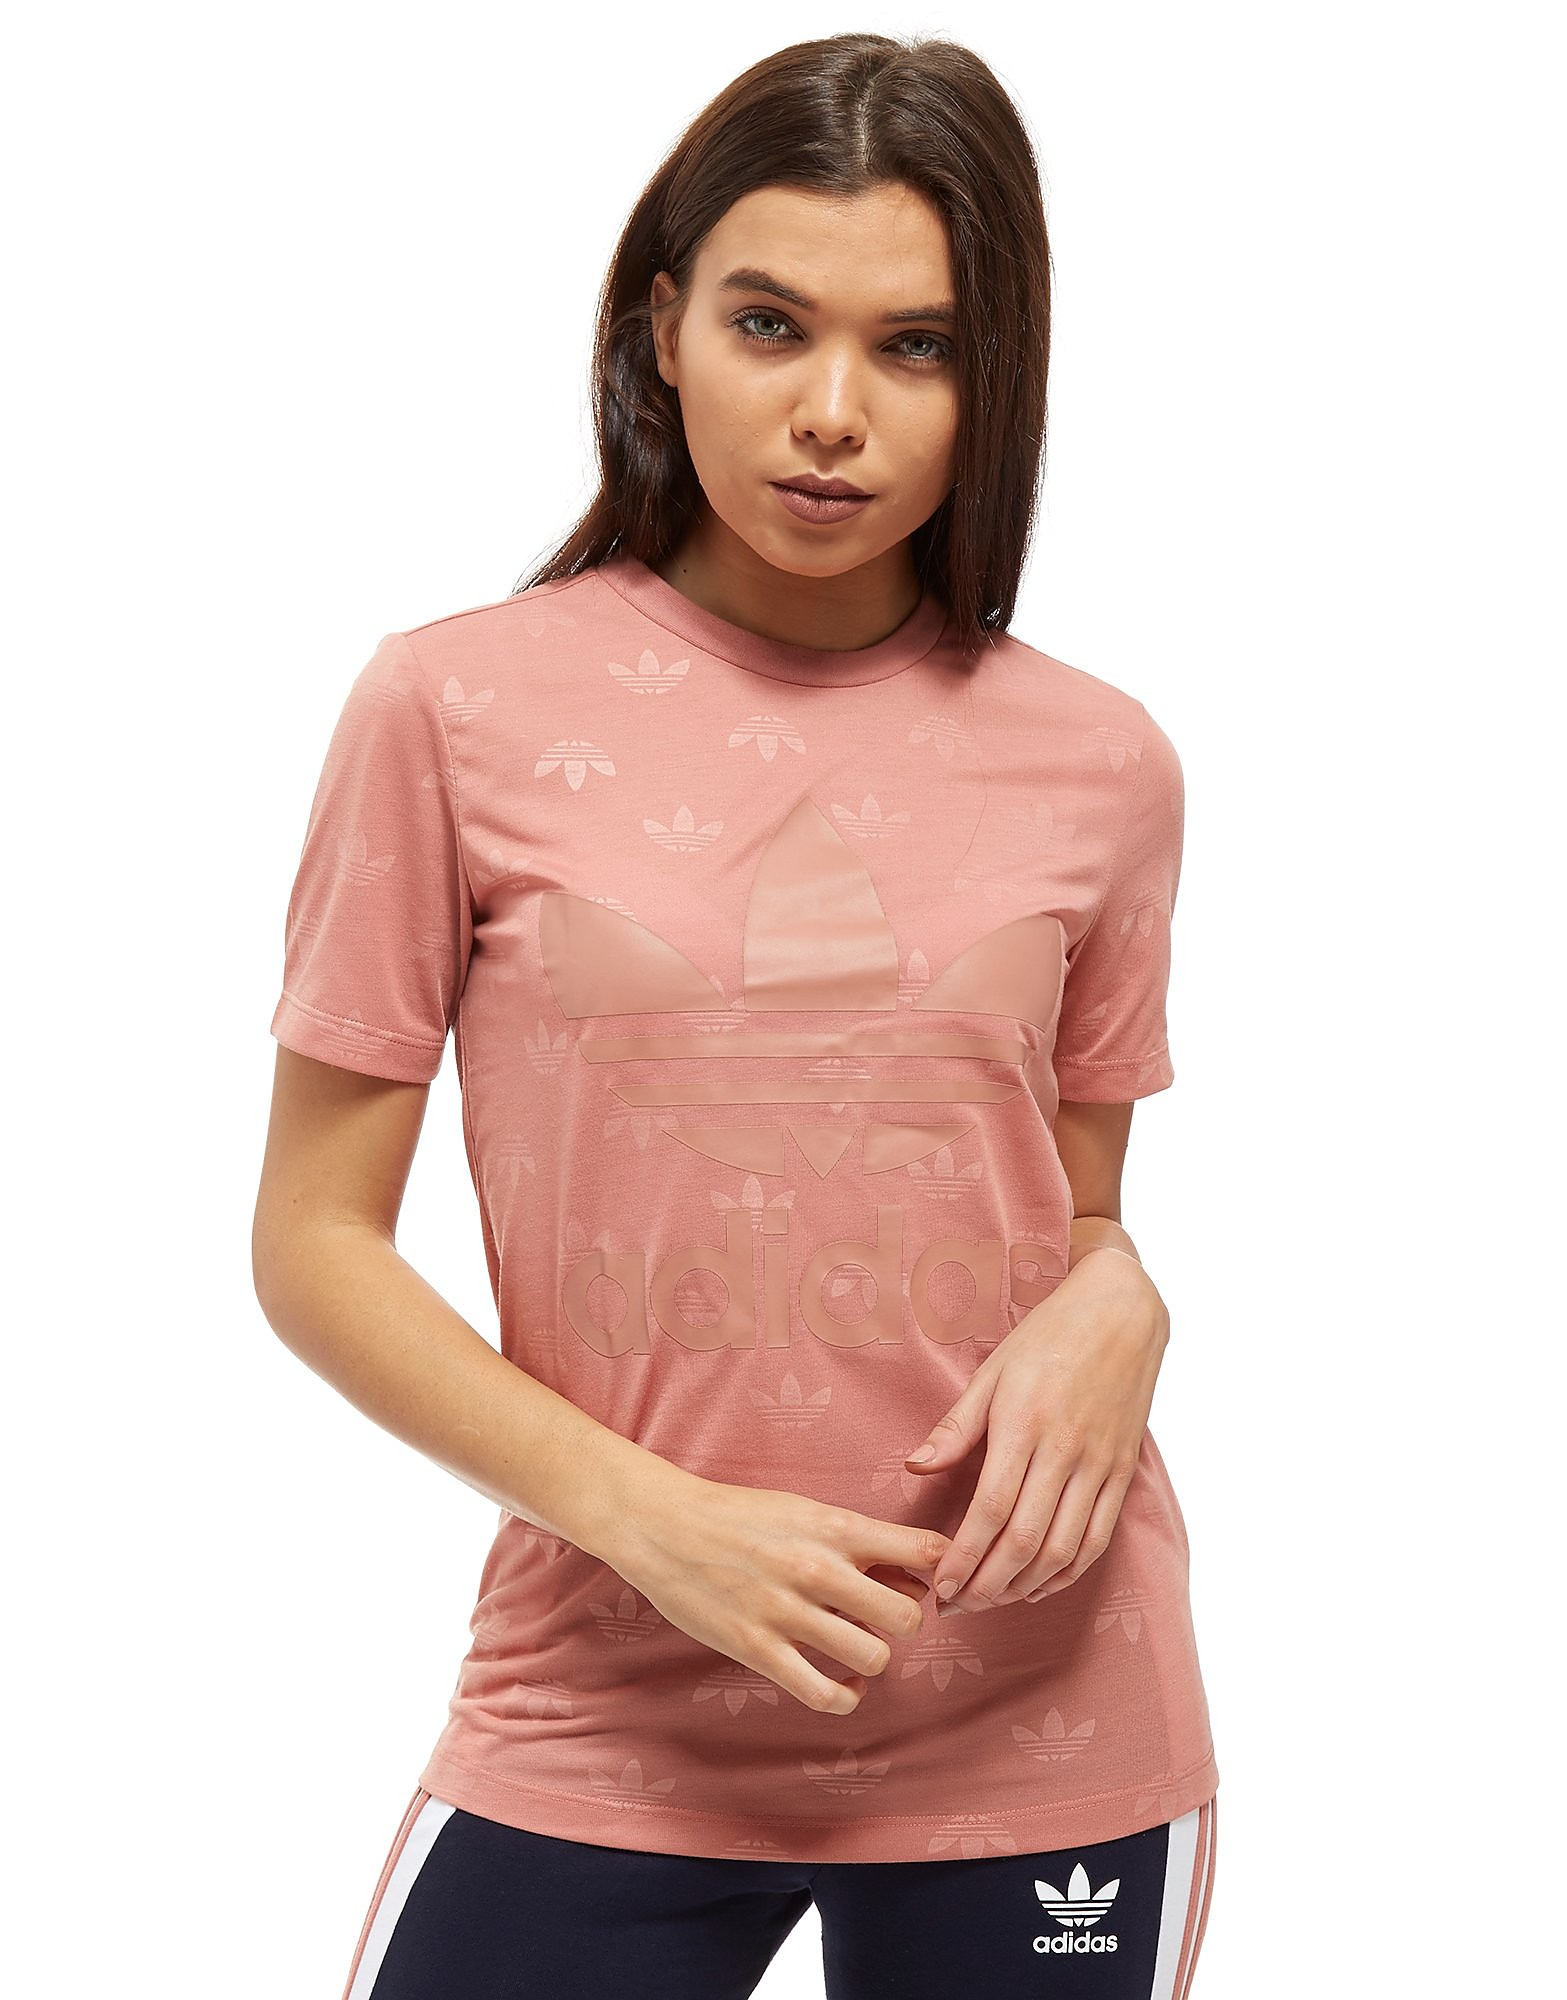 adidas Originals All Over Print Trefoil T-Shirt